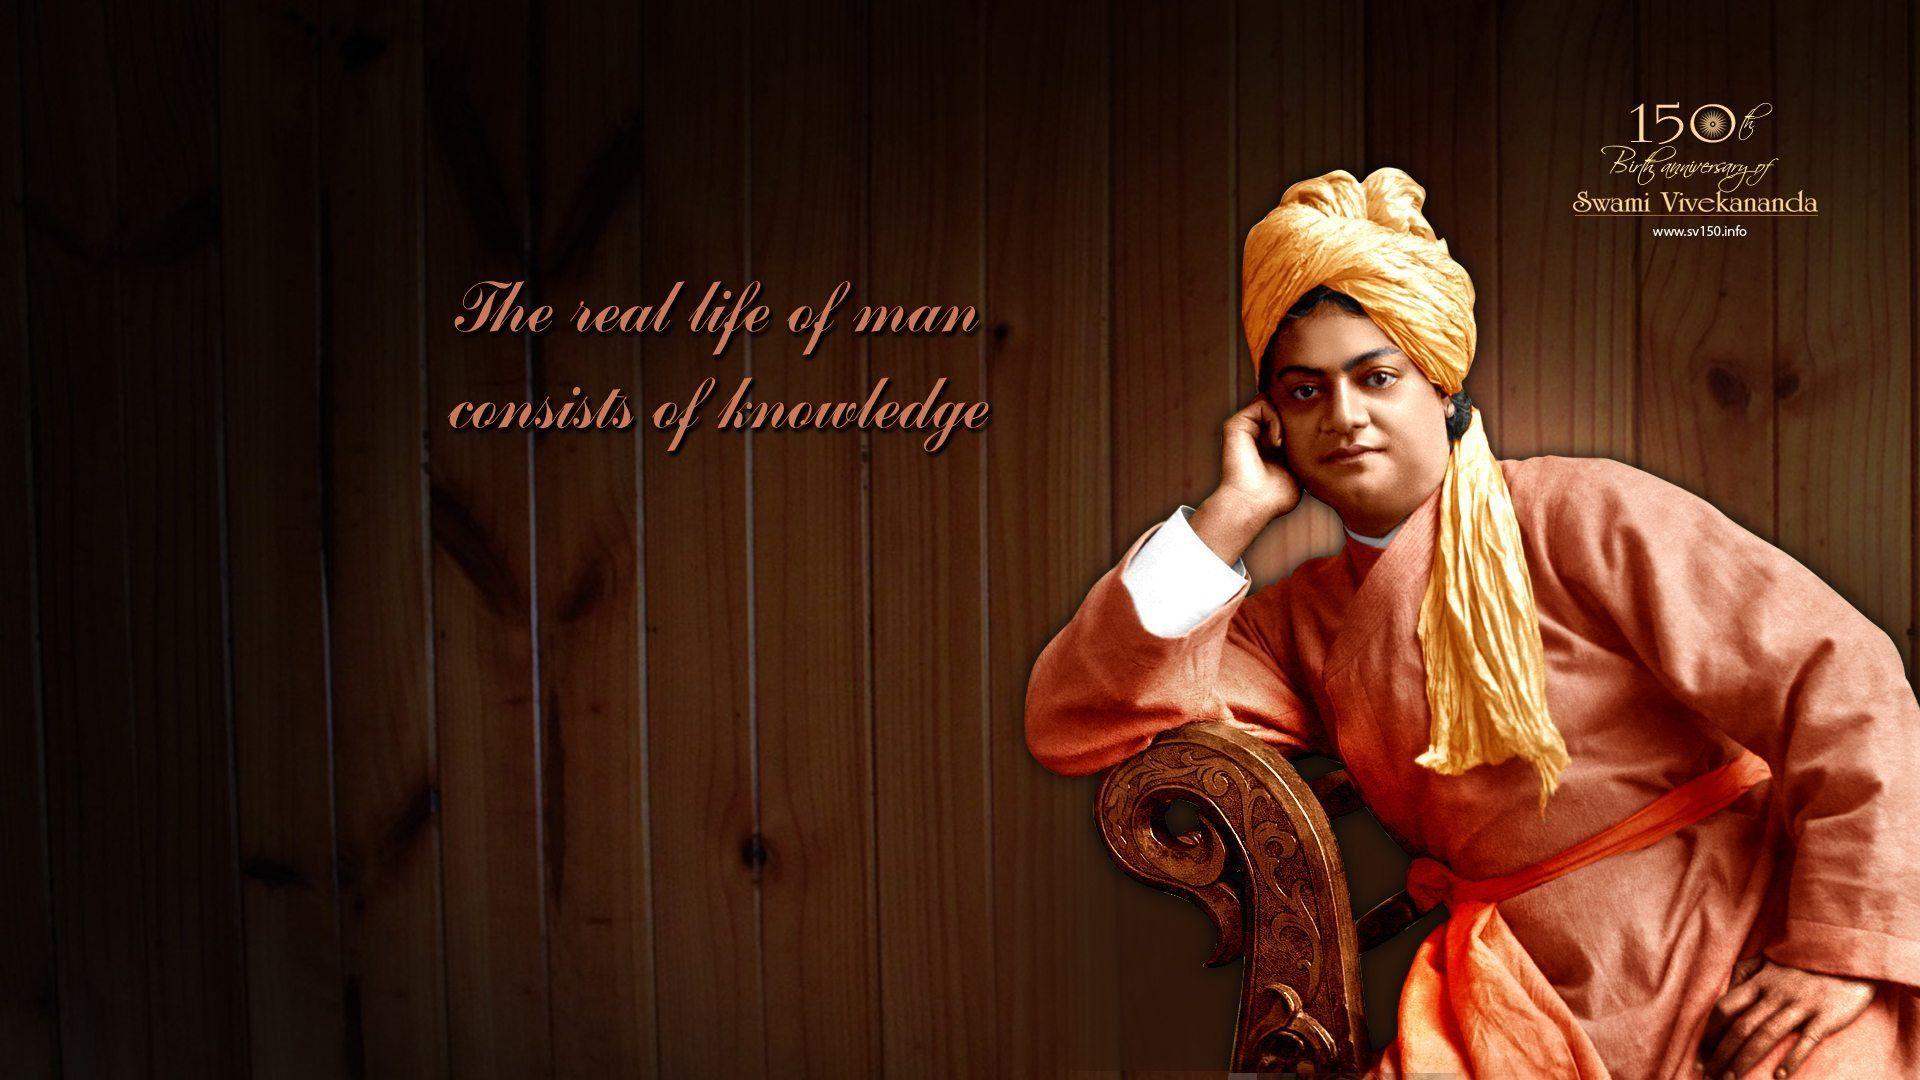 1366x768 Swami Vivekananda HD Wallpapers Download Images Wallpapers 1920x1080